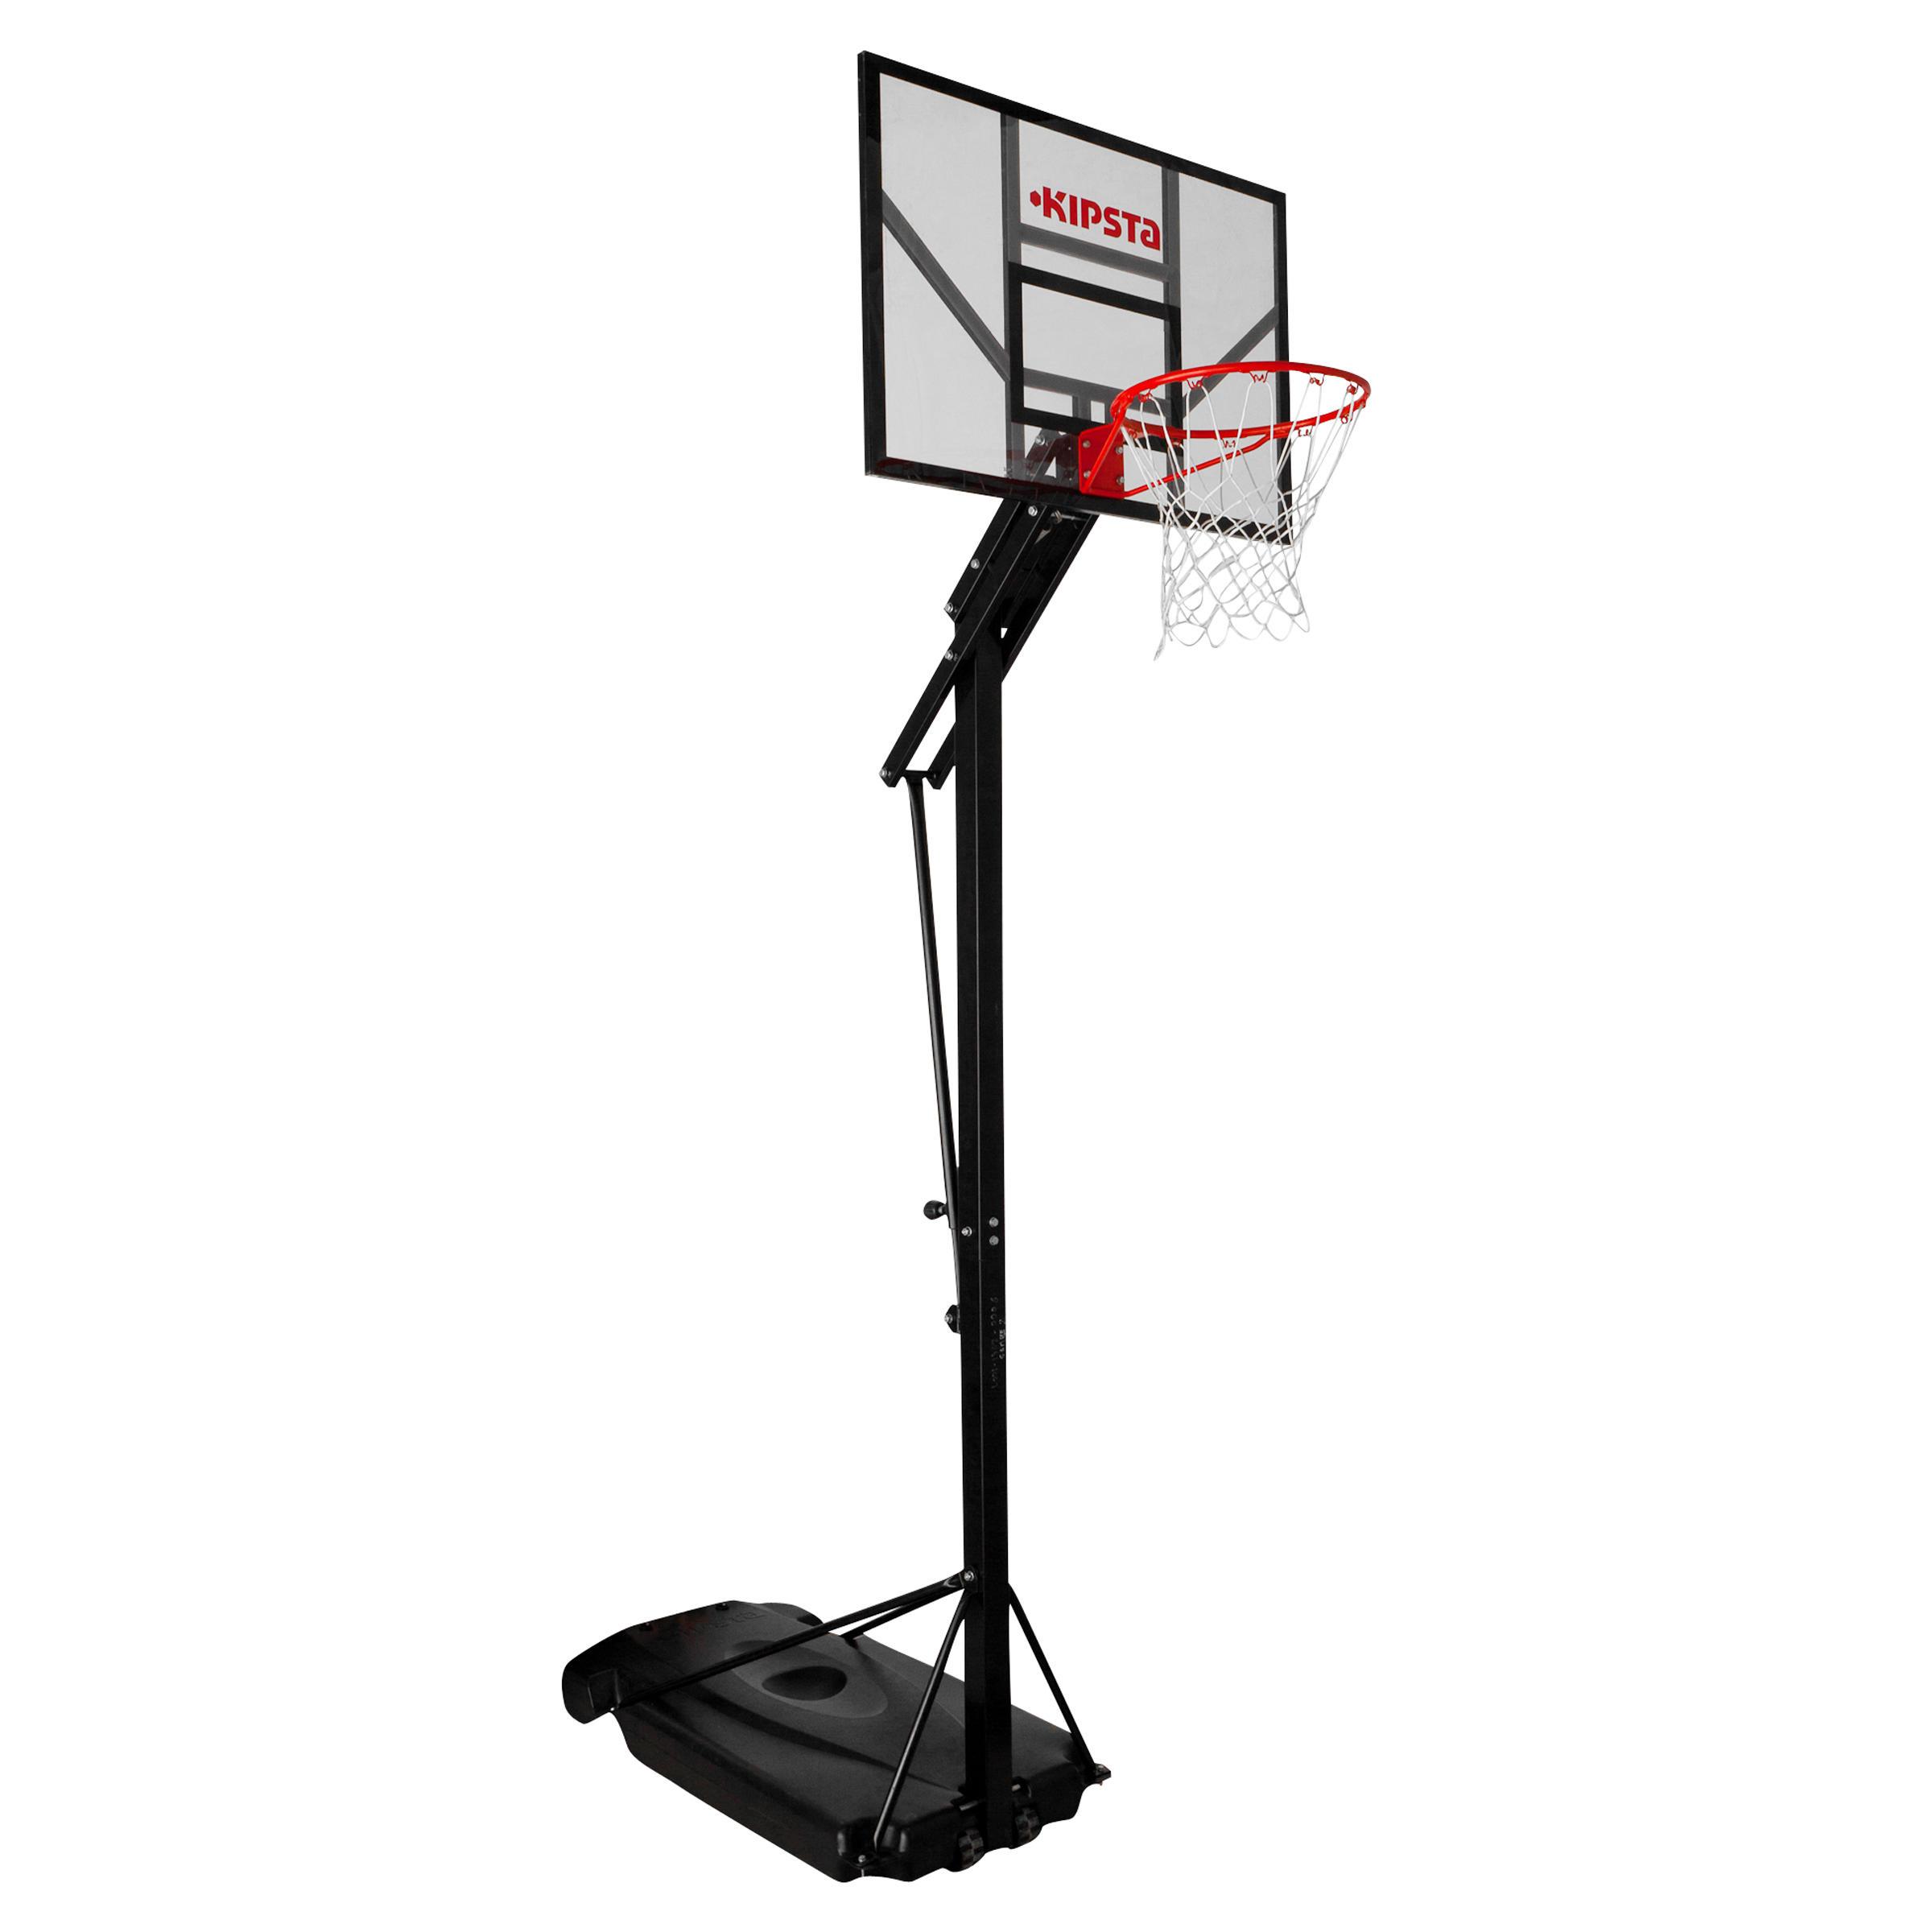 B700 Kids'/Adult Basketball Basket 2.4m to 3.05m. 7 playing heights.